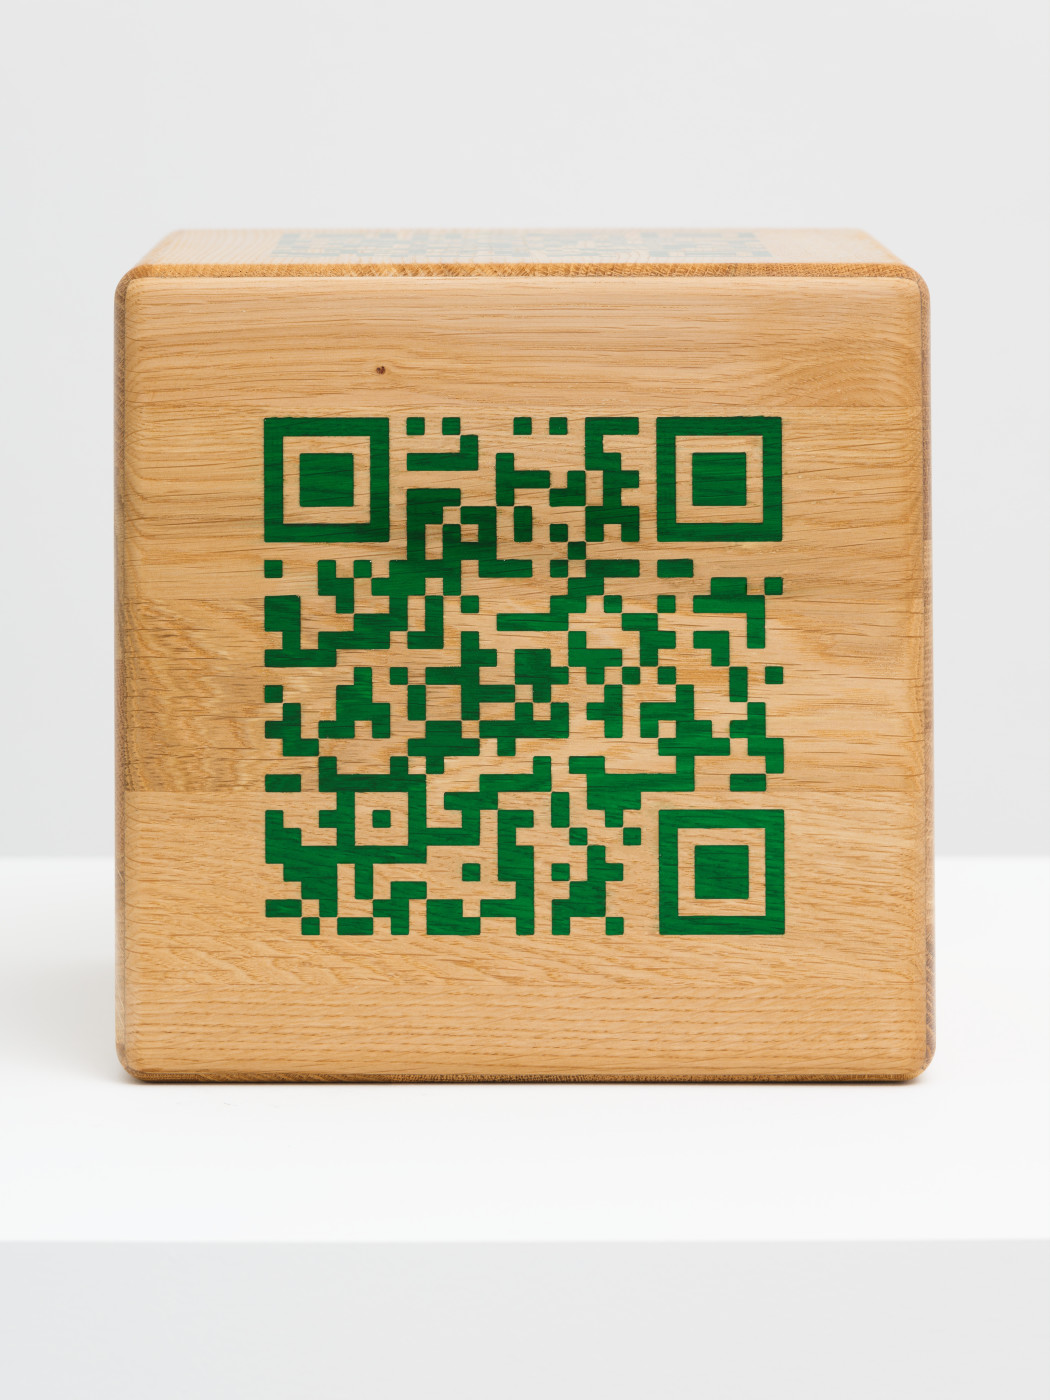 "<div class=""artwork_caption""><div class=""title""><em>6 Sides of Scott Mendes</em></div><div class=""medium"">oak panels, epoxy adhesive, trans emerald epoxy filler</div><div class=""dimensions"">Cube size : 21.5 x 21.5 x 21.5 cm<br />QR–Code size : 13.5 x 13.5 cm (each side has an individual code in the same size)</div></div><div class=""link""><span class=""website_contact_form"" data-contact-form-details=""6 Sides of Scott Mendes  oak panels, epoxy adhesive, trans emerald epoxy filler  Cube size : 21.5 x 21.5 x 21.5 cm QR–Code size : 13.5 x 13.5 cm (each side has an individual code in the same size)"" data-contact-form-image=""https://artlogic-res.cloudinary.com/w_200,h_200,c_fill,f_auto,fl_lossy/ws-sadiecoles/usr/exhibitions/images/exhibitions/865/hq24-db17550_qr-code_detail_6.jpeg"">Enquire</span></div>"